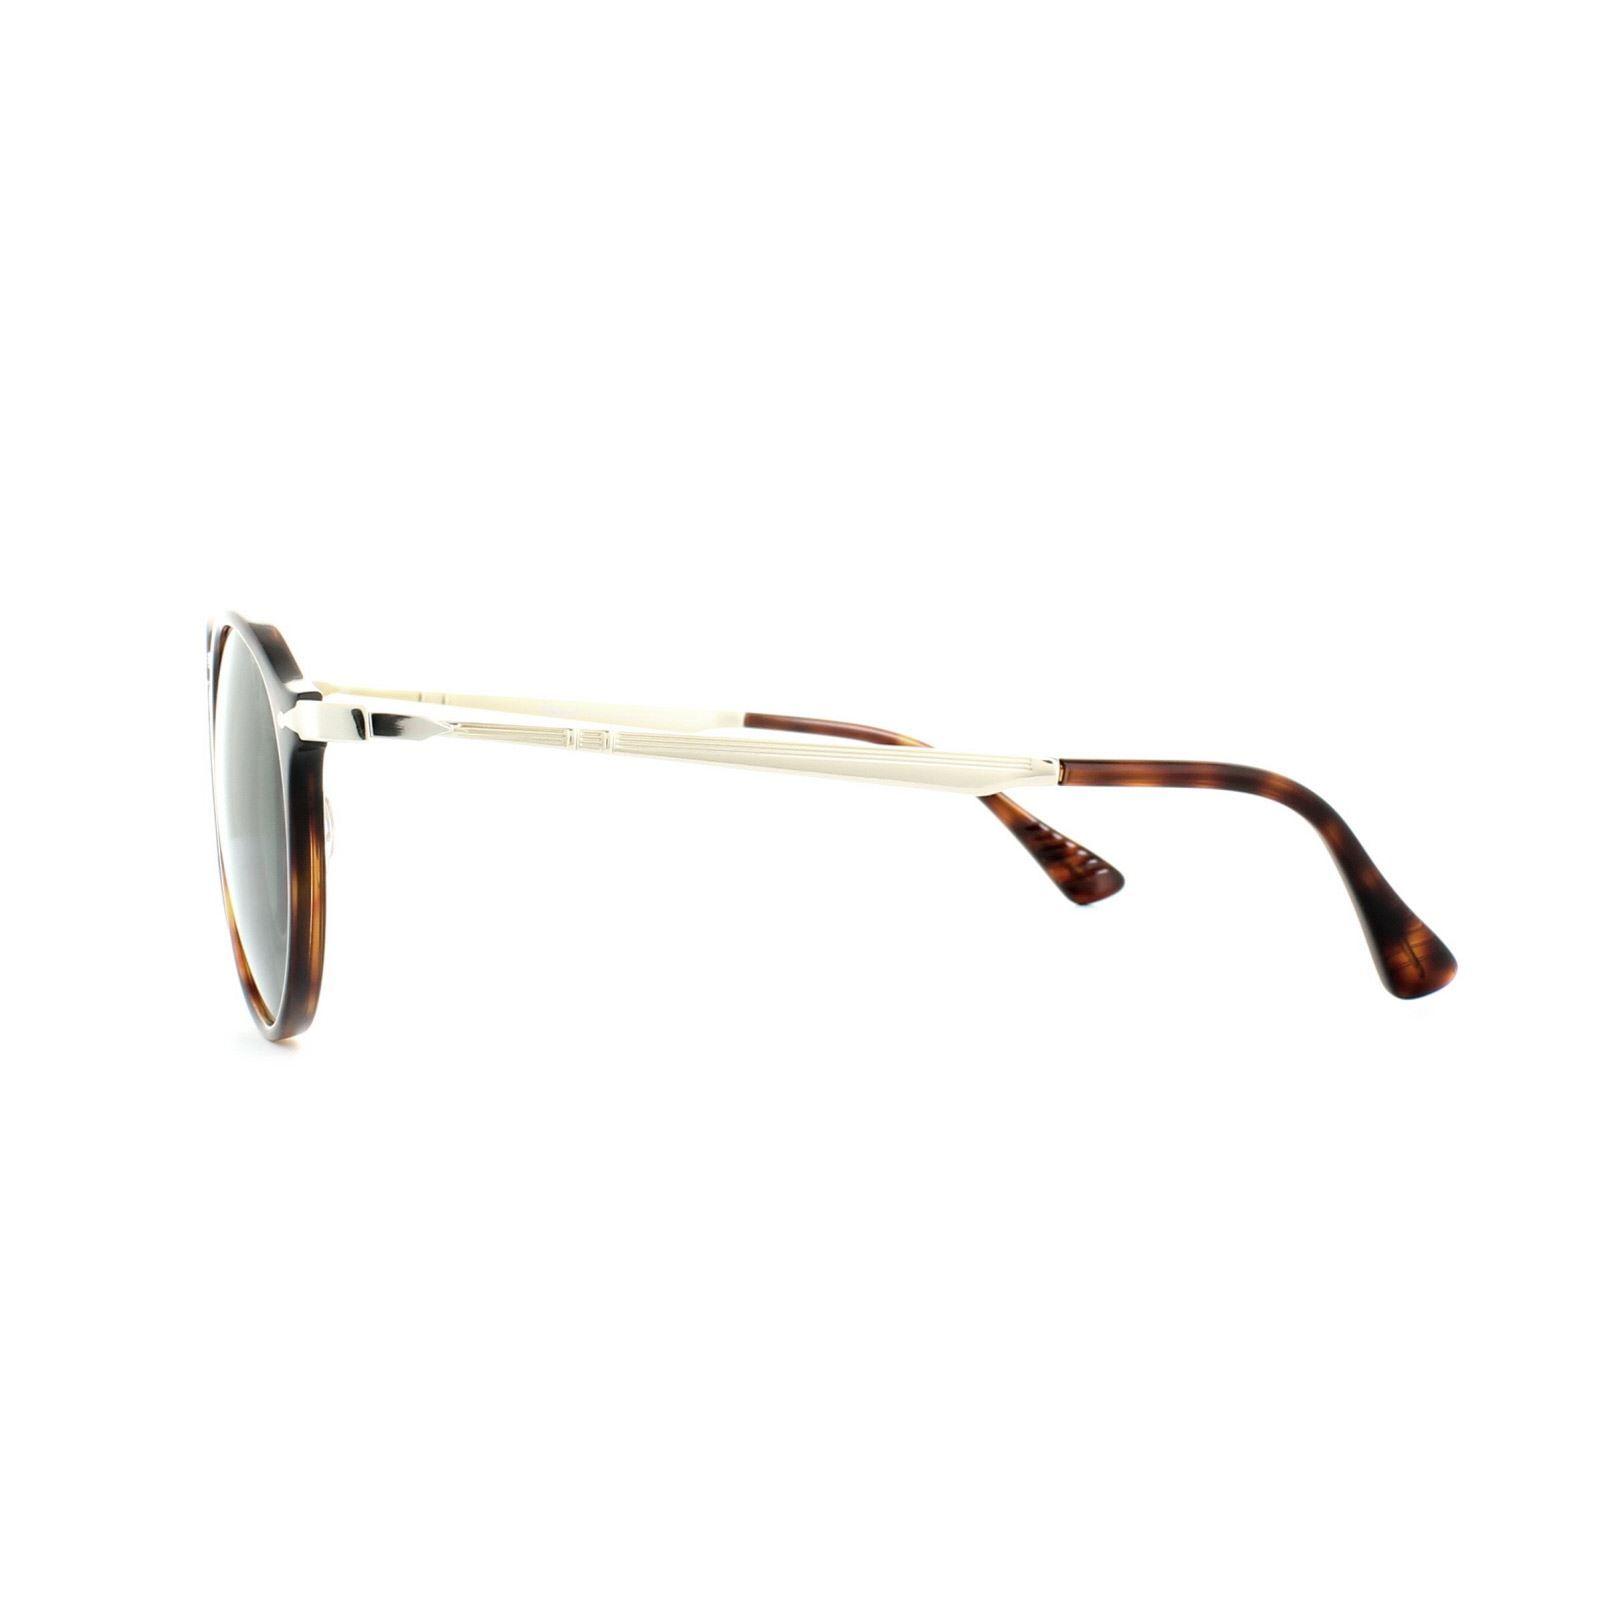 Persol Sunglasses 3166 24/31 Havana Grey Green